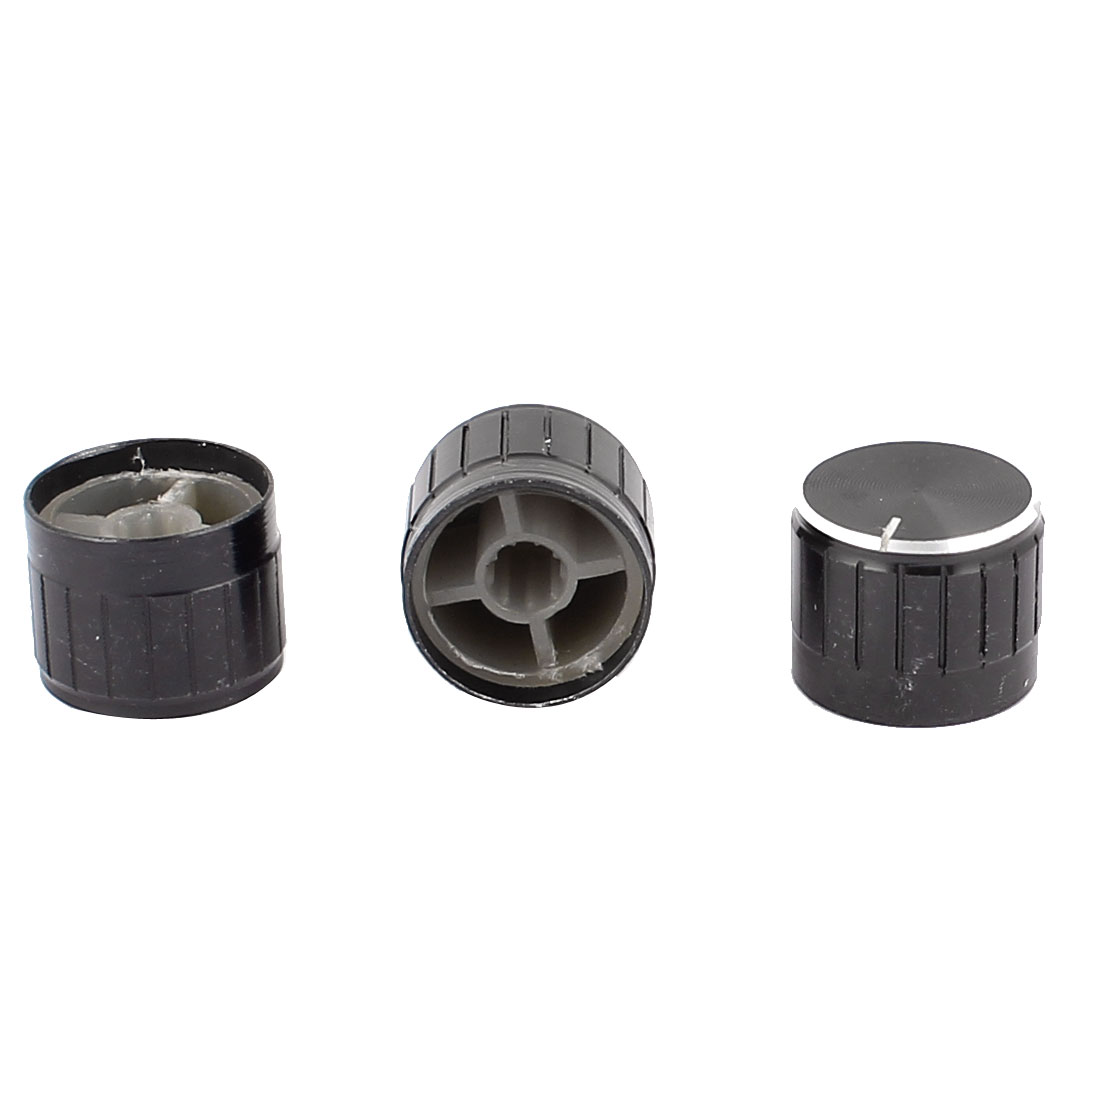 3 Pcs 21mm x 6mm Aluminium Alloy Potentiometer Control Knob Mini Cap Knurled Button Black